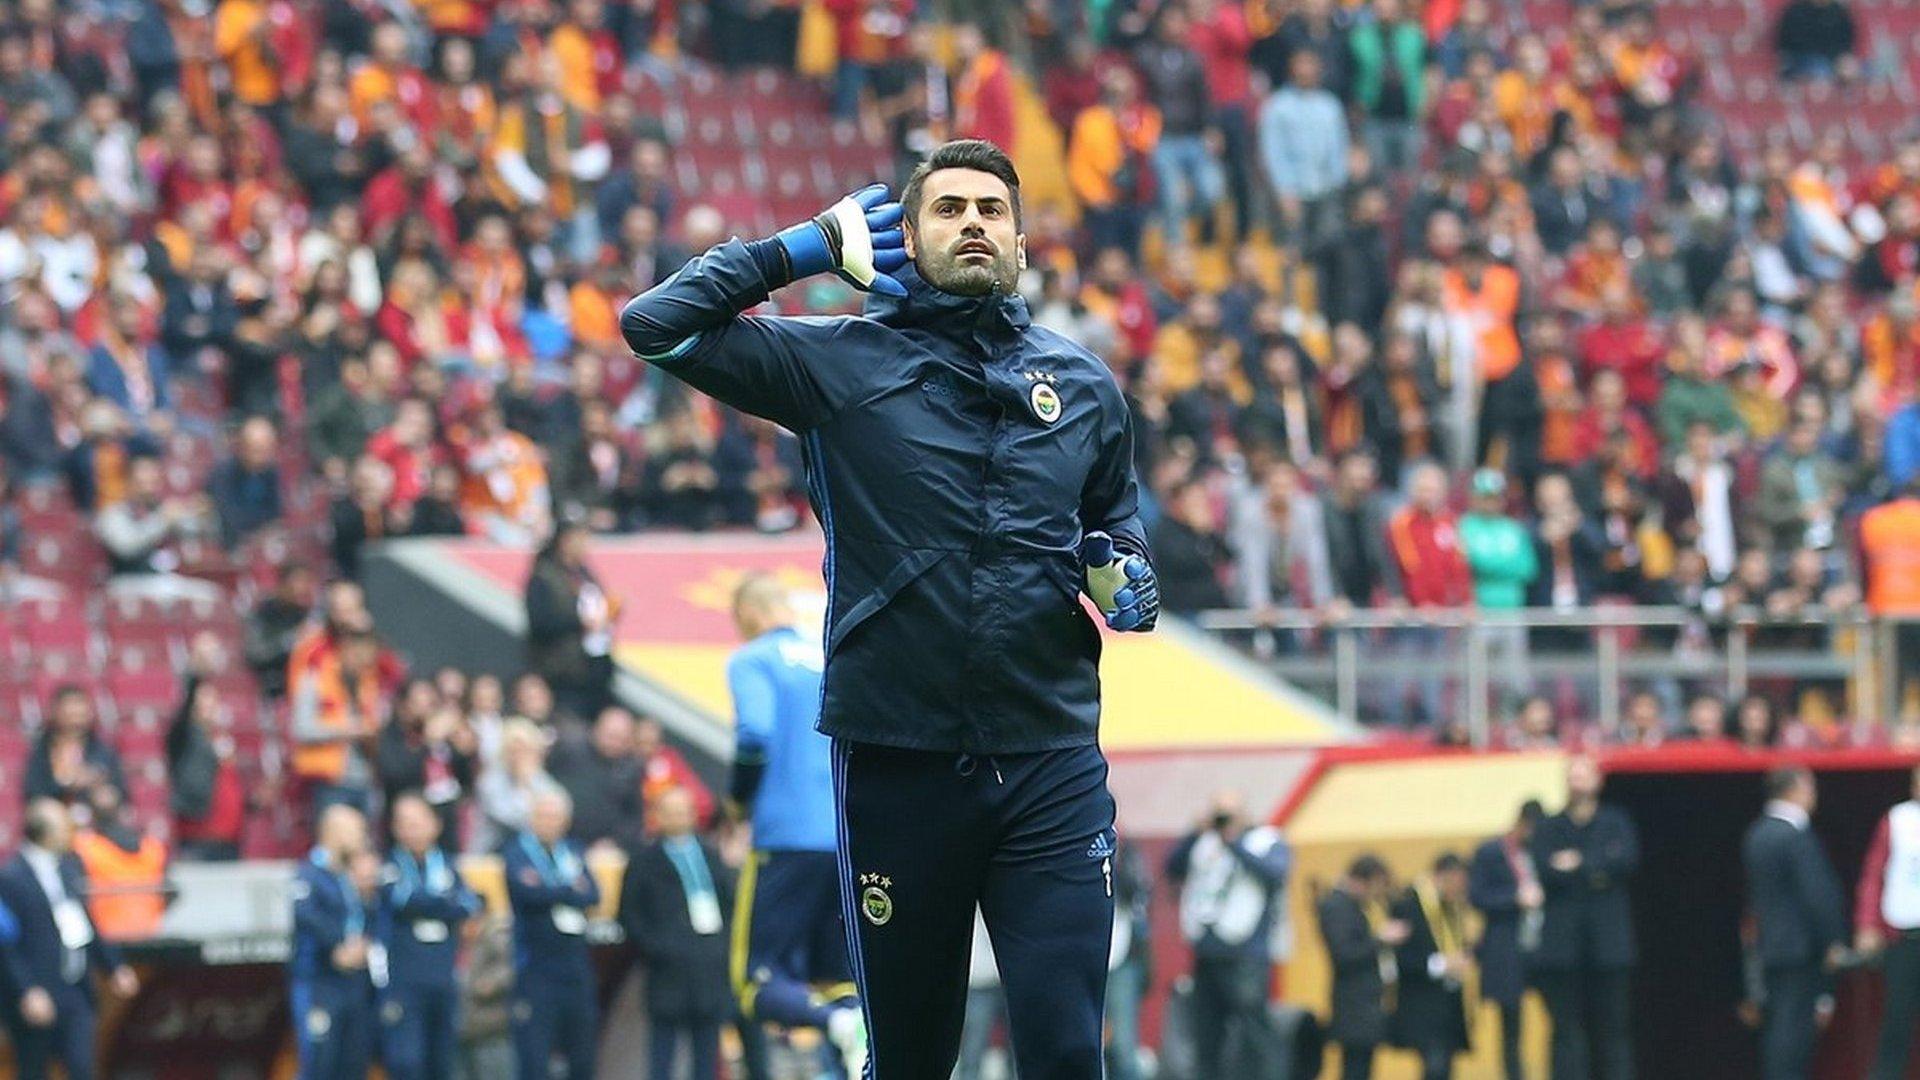 Galatasaray_Fenerbahce_Volkan_Demirel_23042017